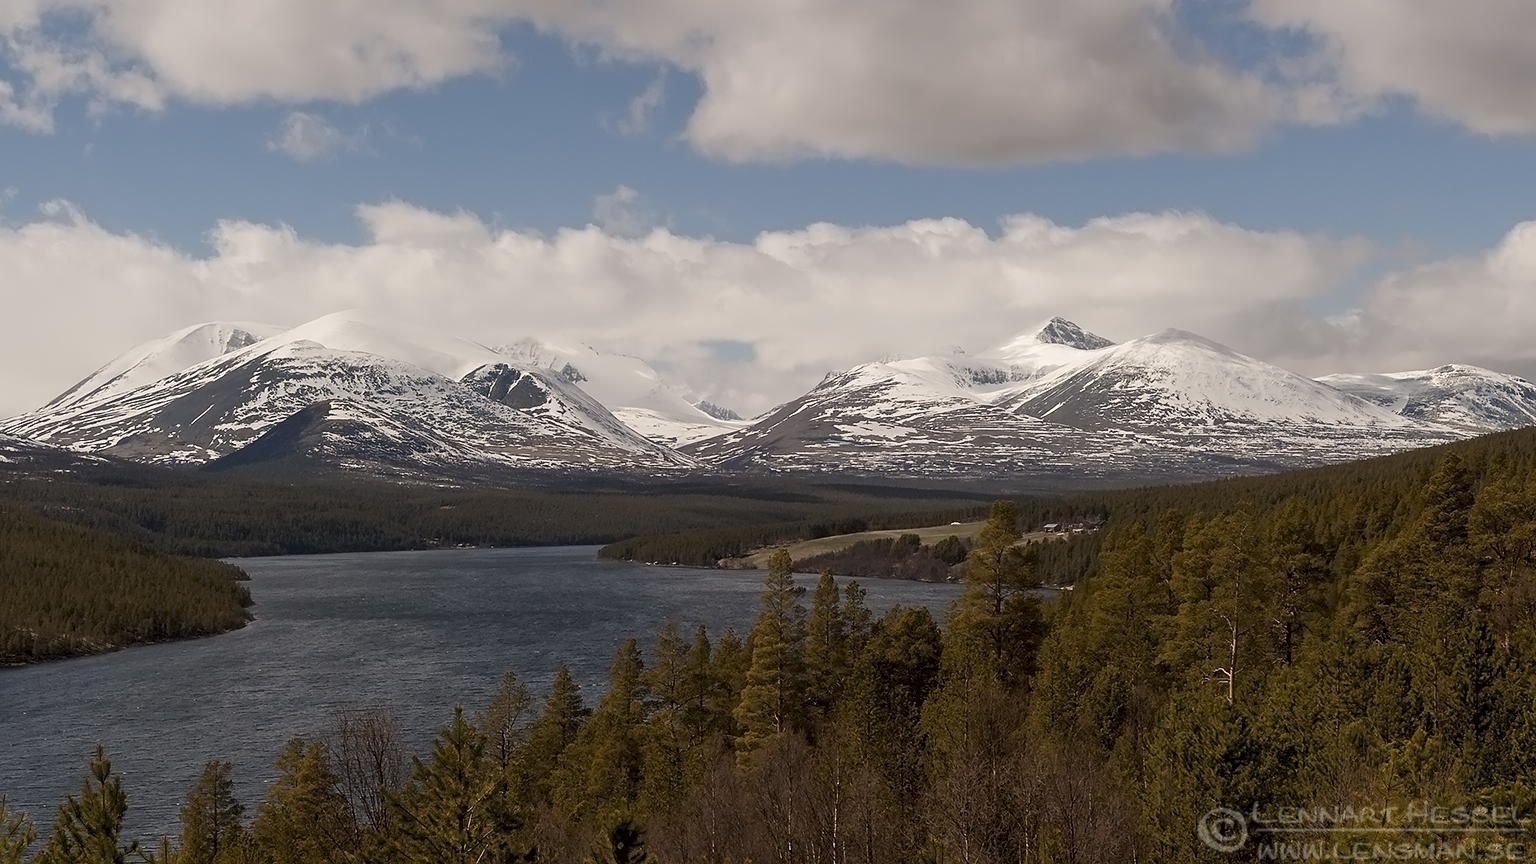 Rondane Dovrefjell